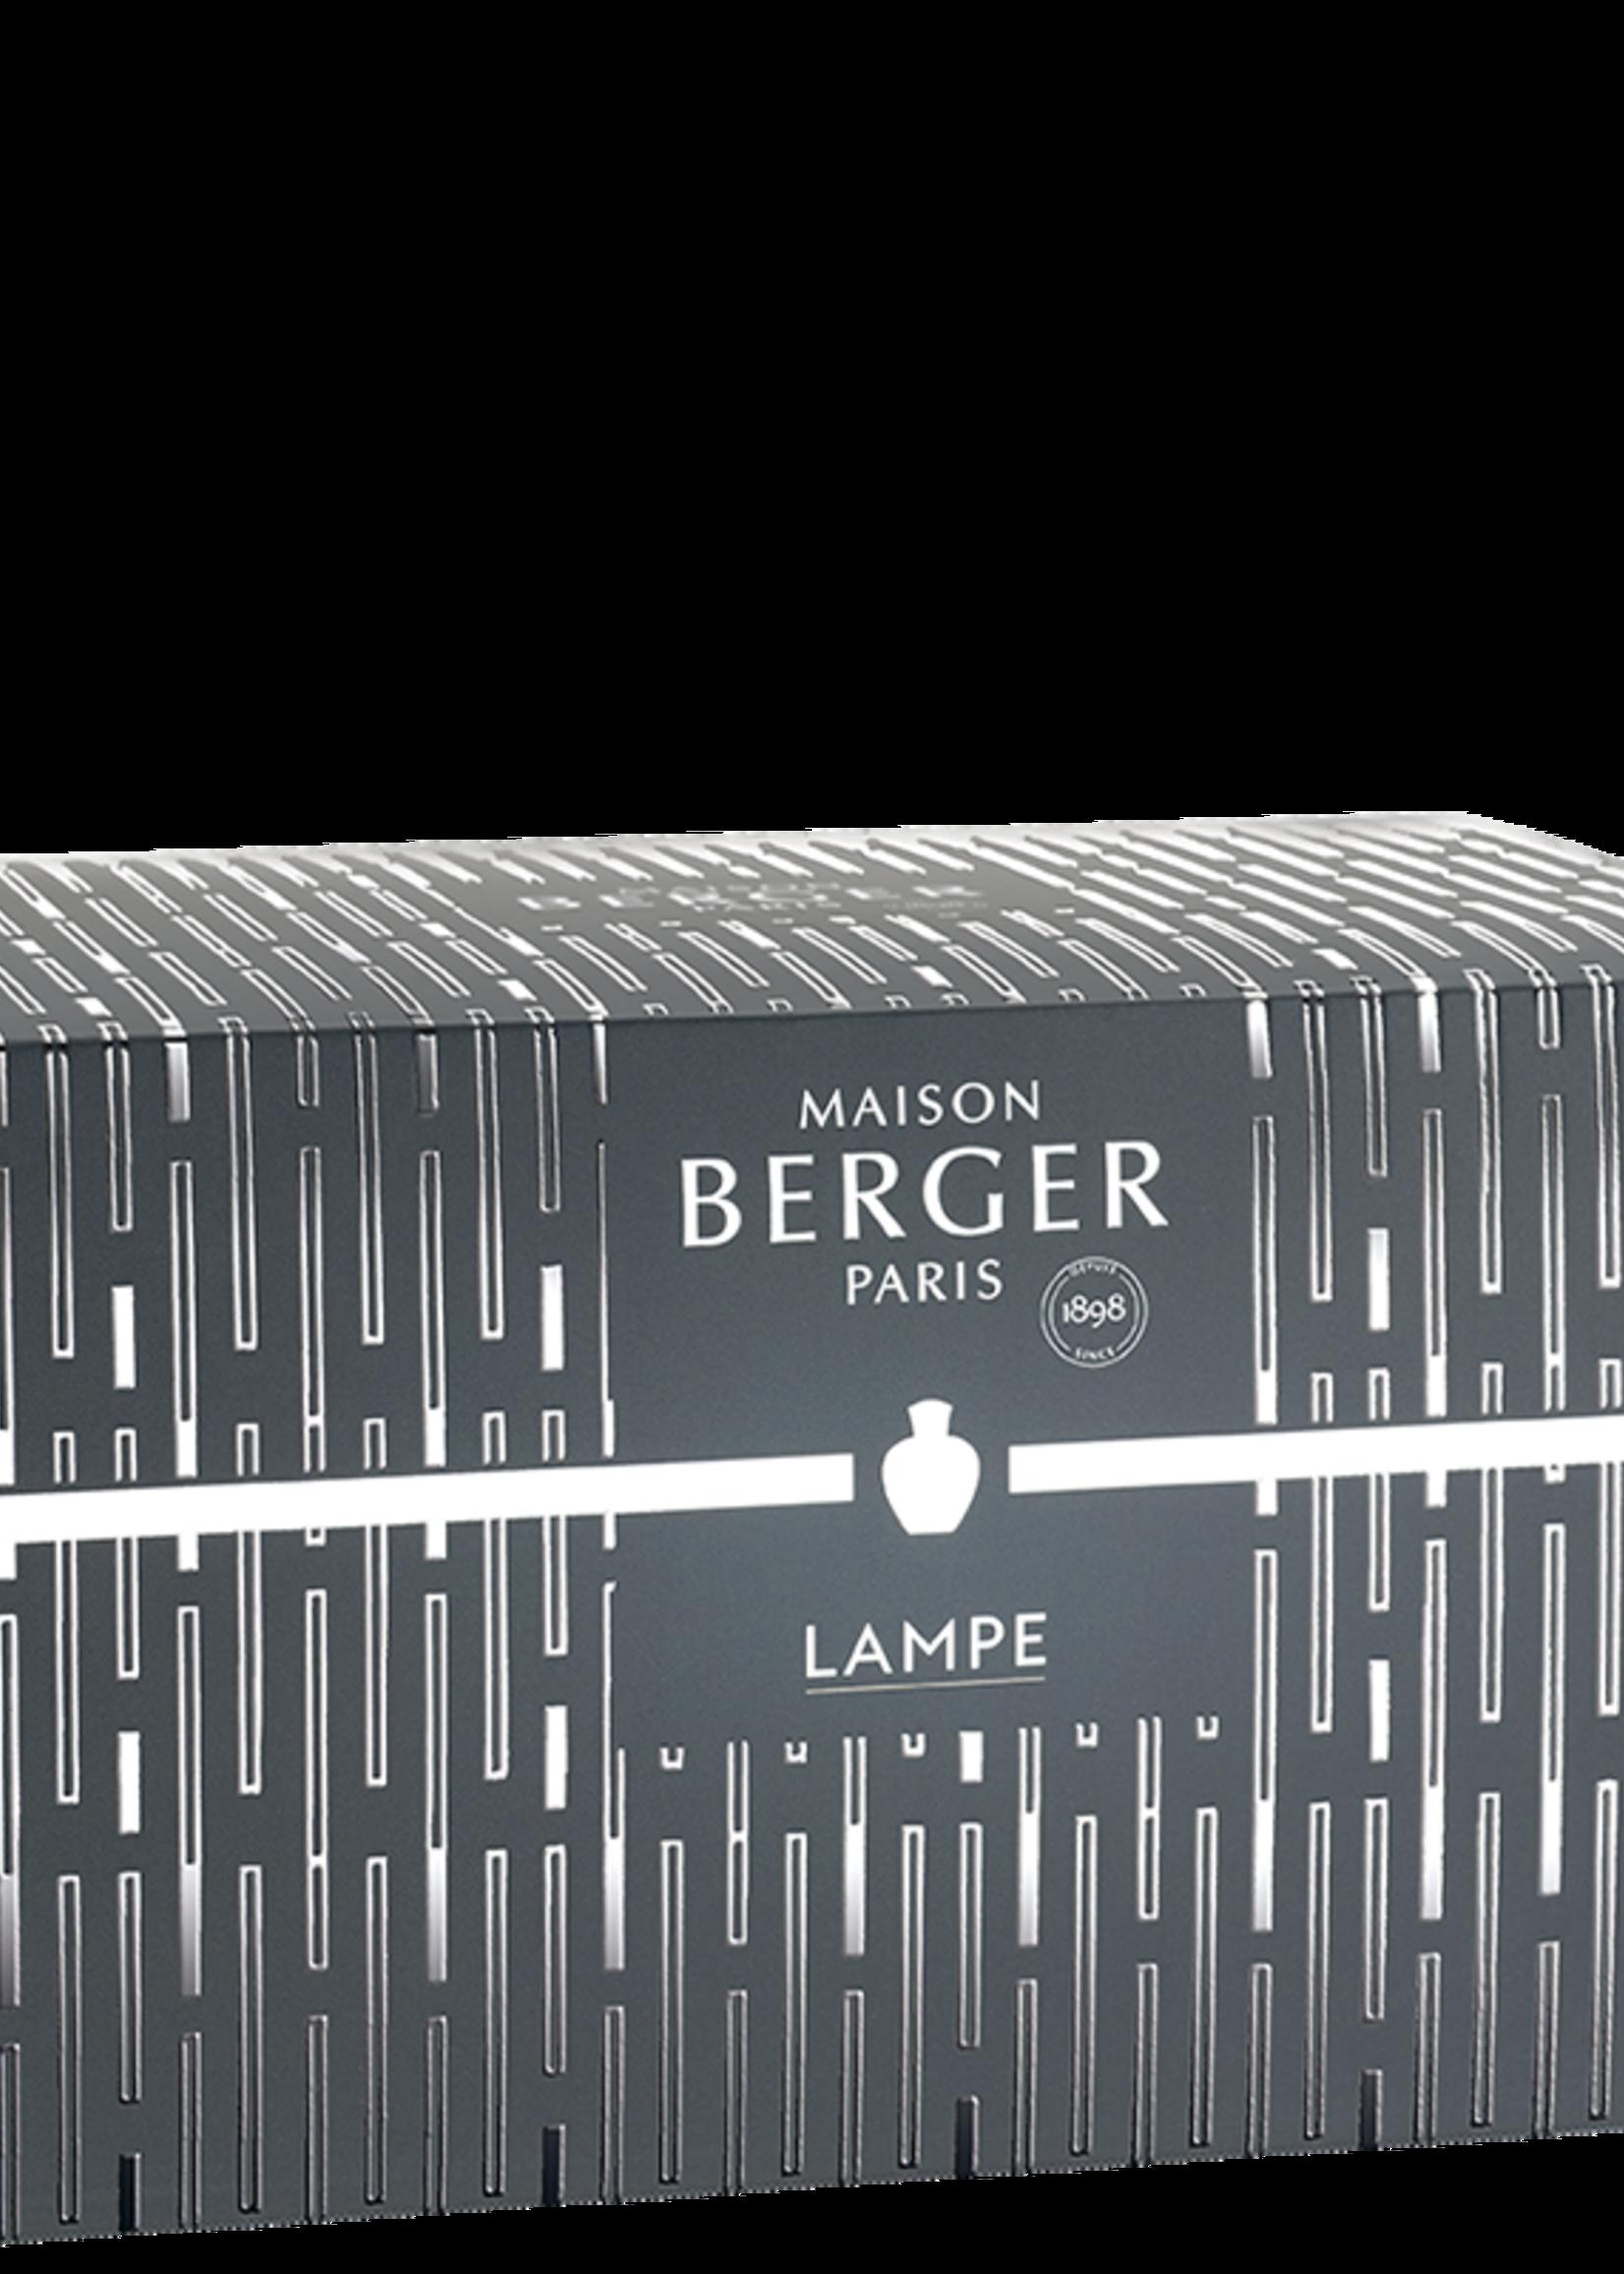 Lampe Berger Giftset Lampe Berger Amphora Noire